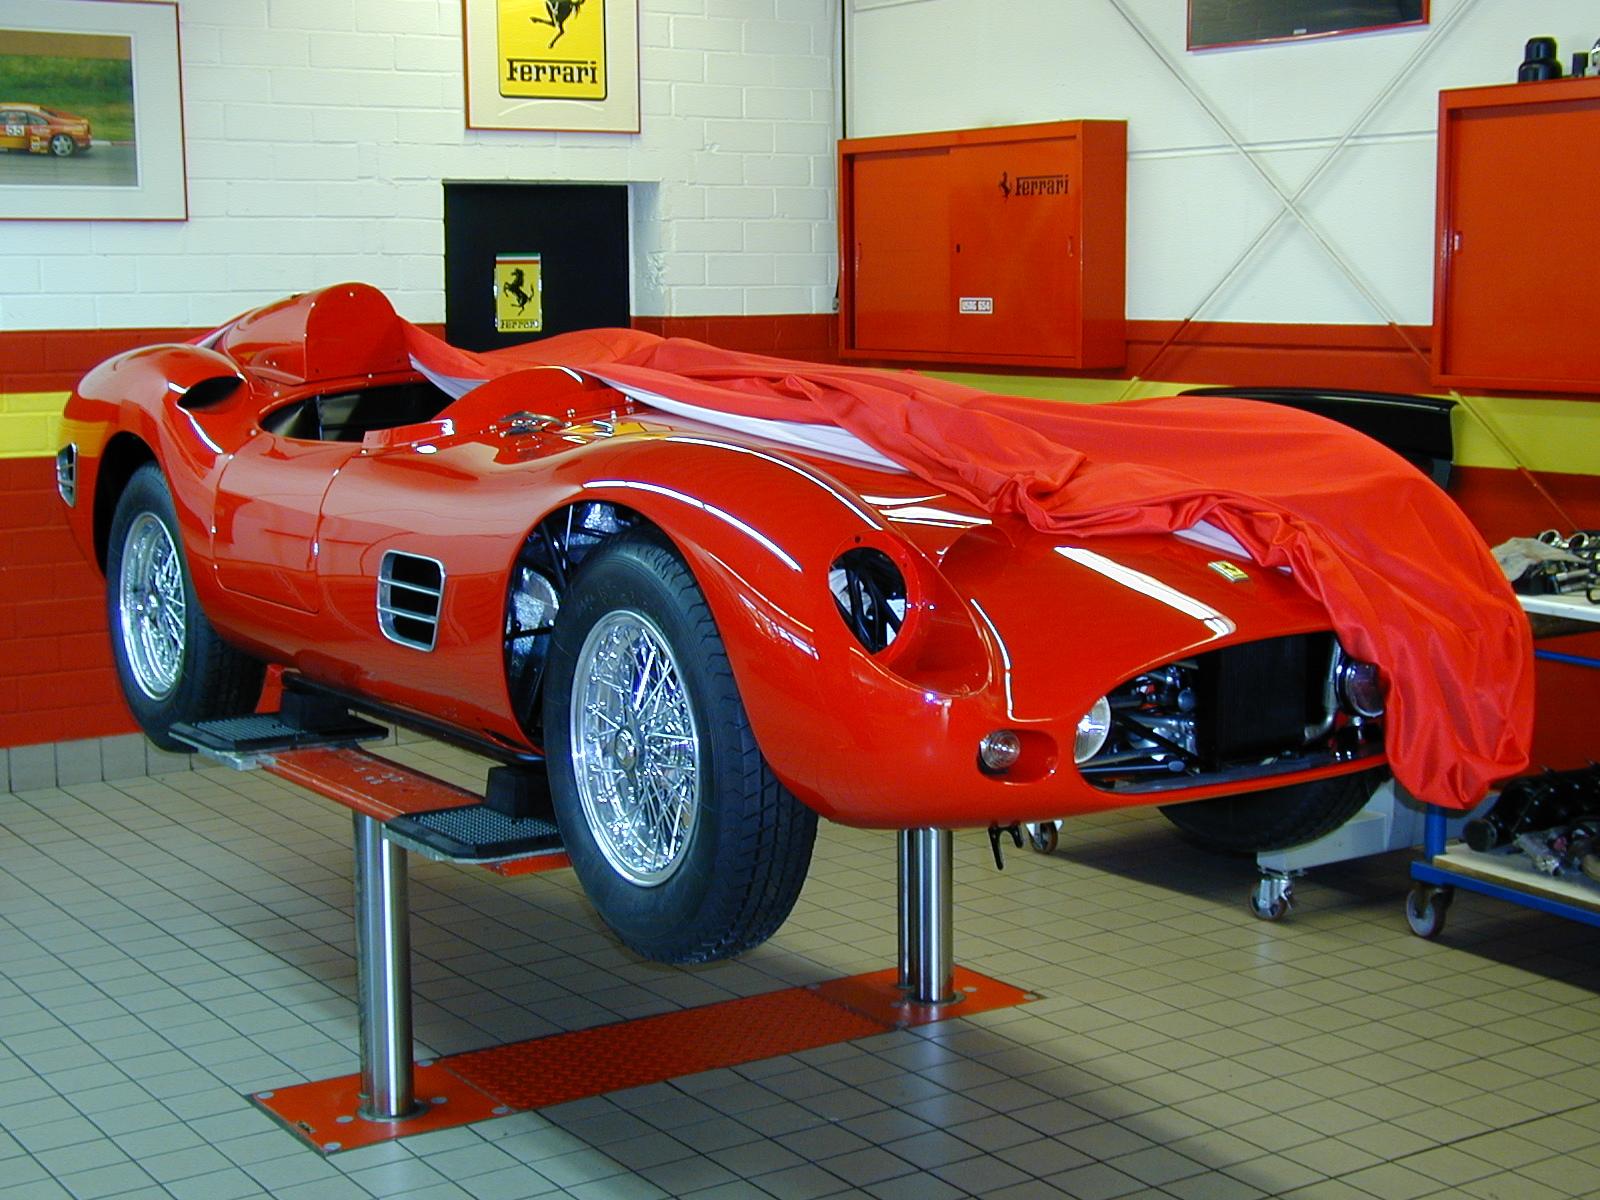 1959 Ferrari 250 Testarossa restoration